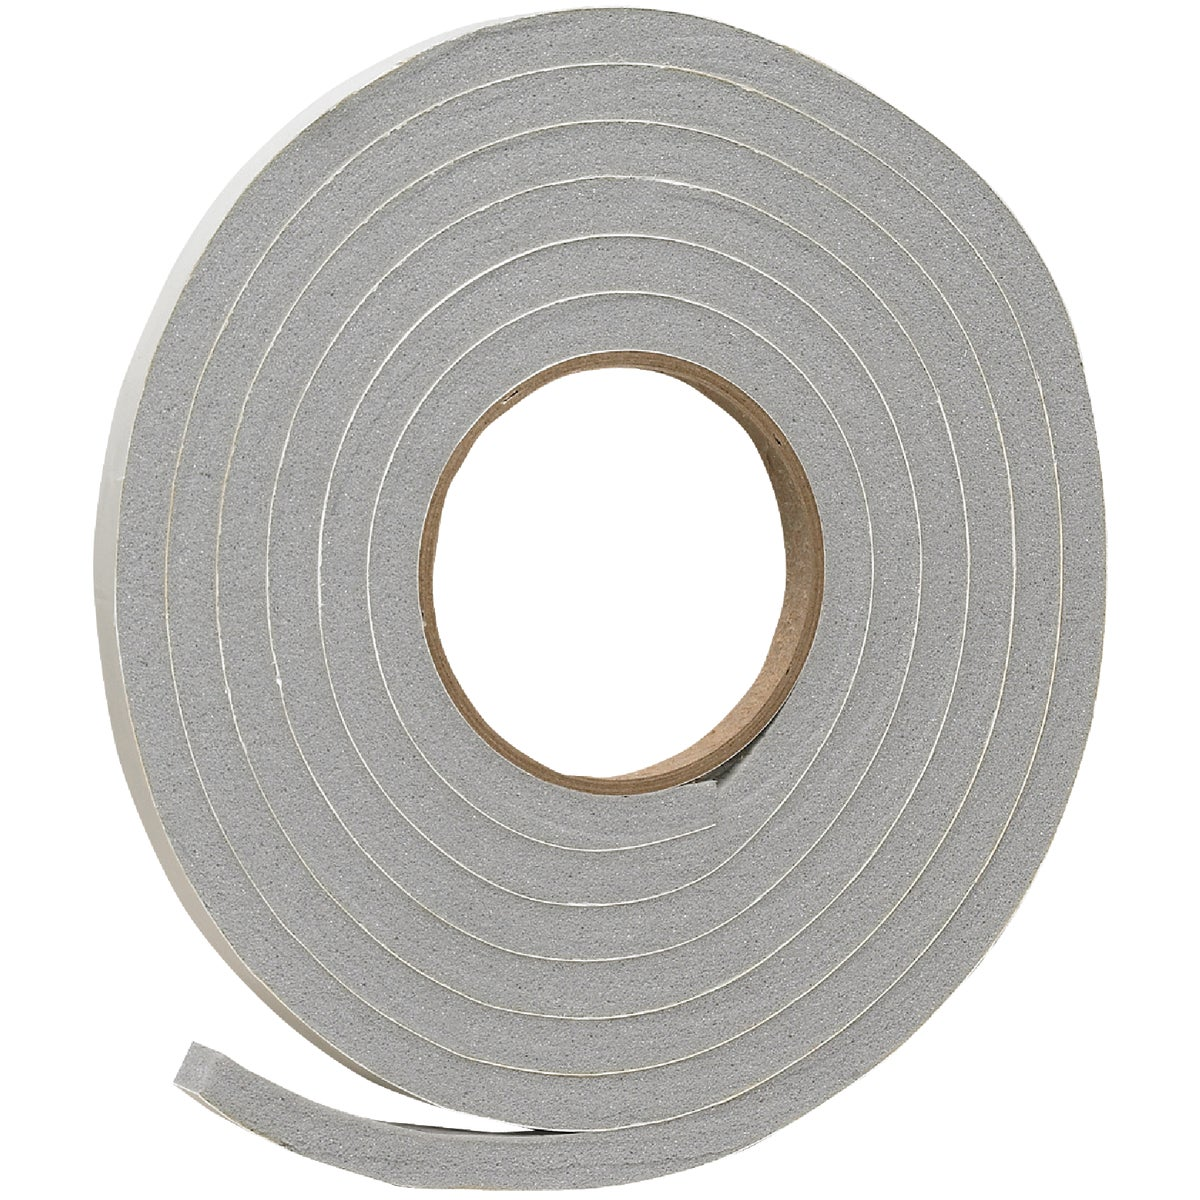 "1/2X3/8""X10' PVC TAPE"